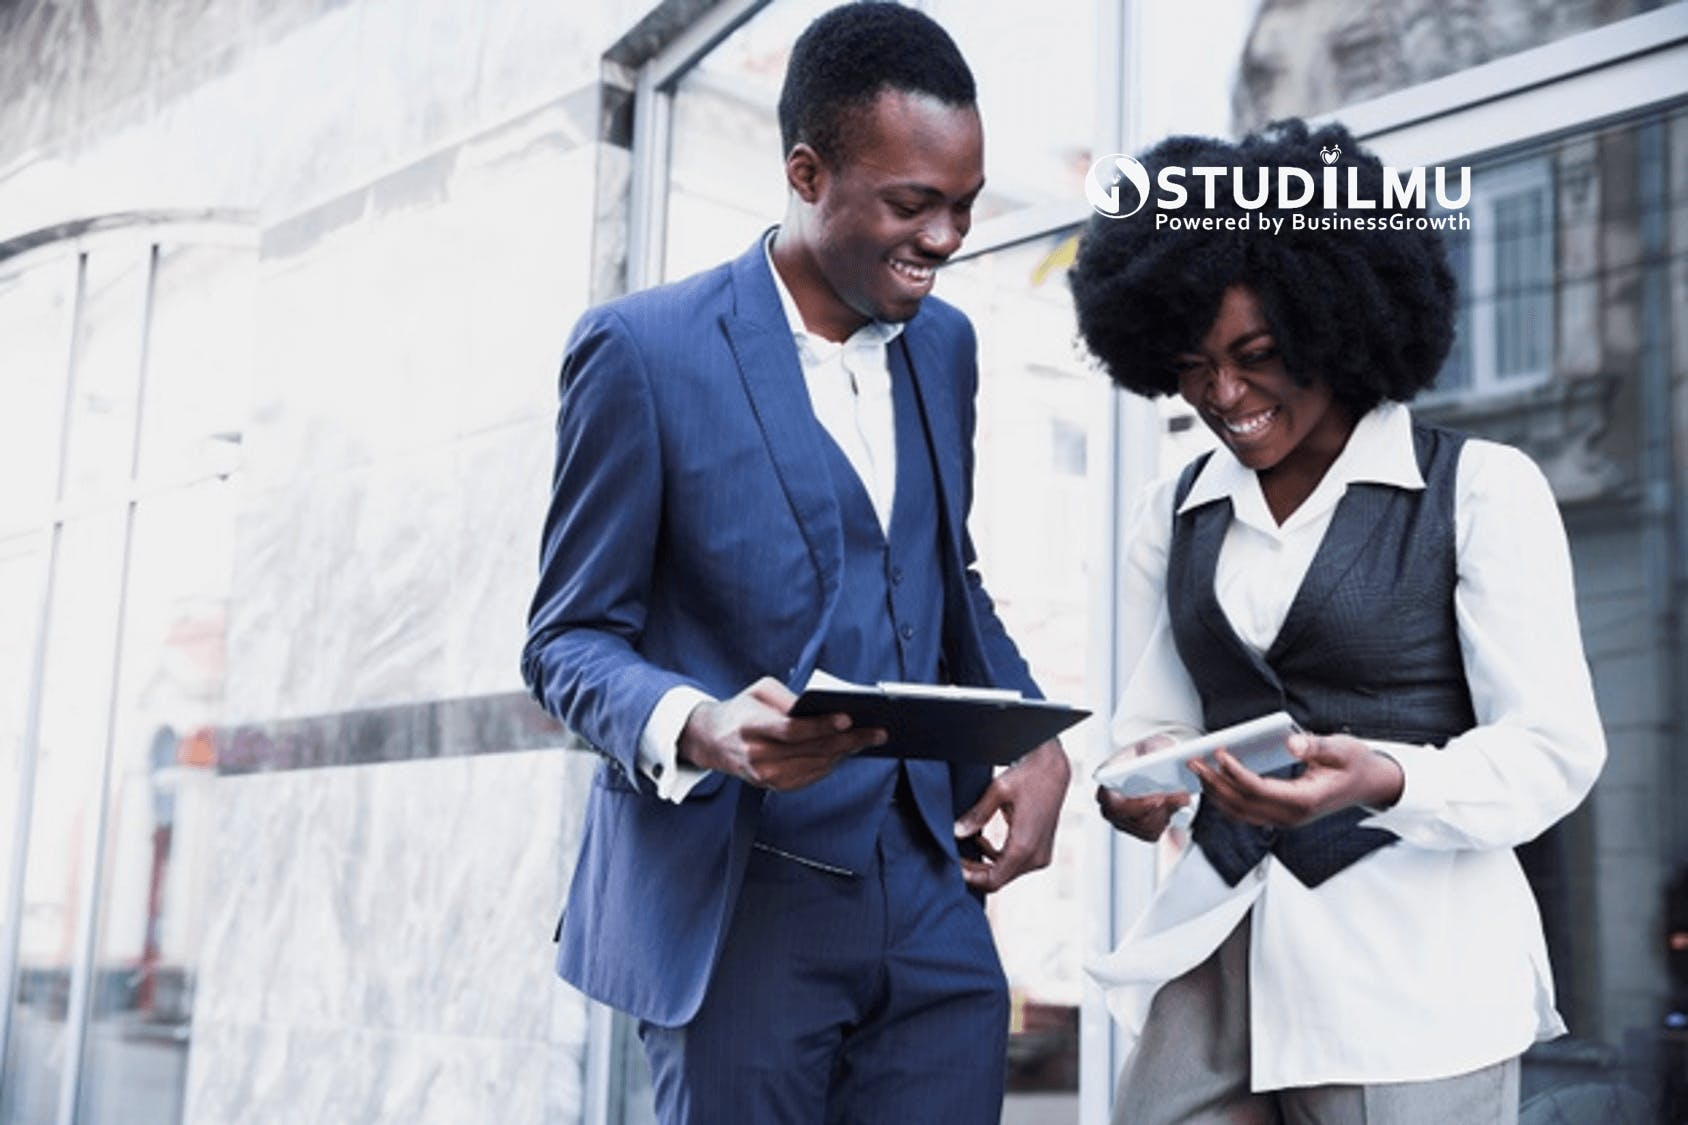 STUDILMU Career Advice - 6 Pertanyaan Untuk Mendapatkan Umpan Balik Tentang Kualitas Produk